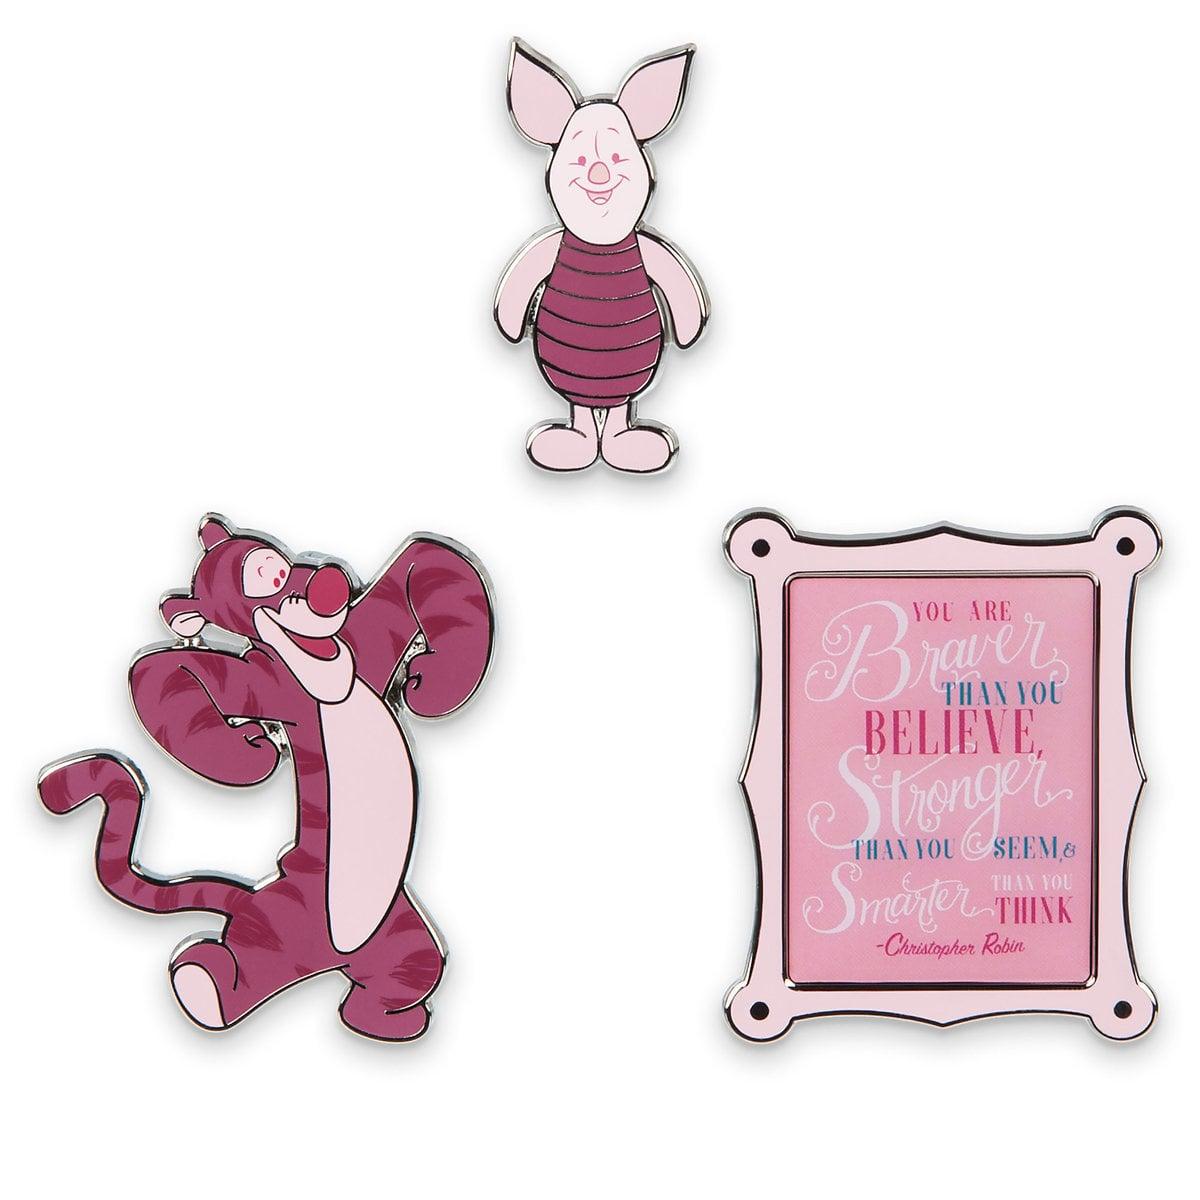 Disney Wisdom Collection Piglet Plush April 2019